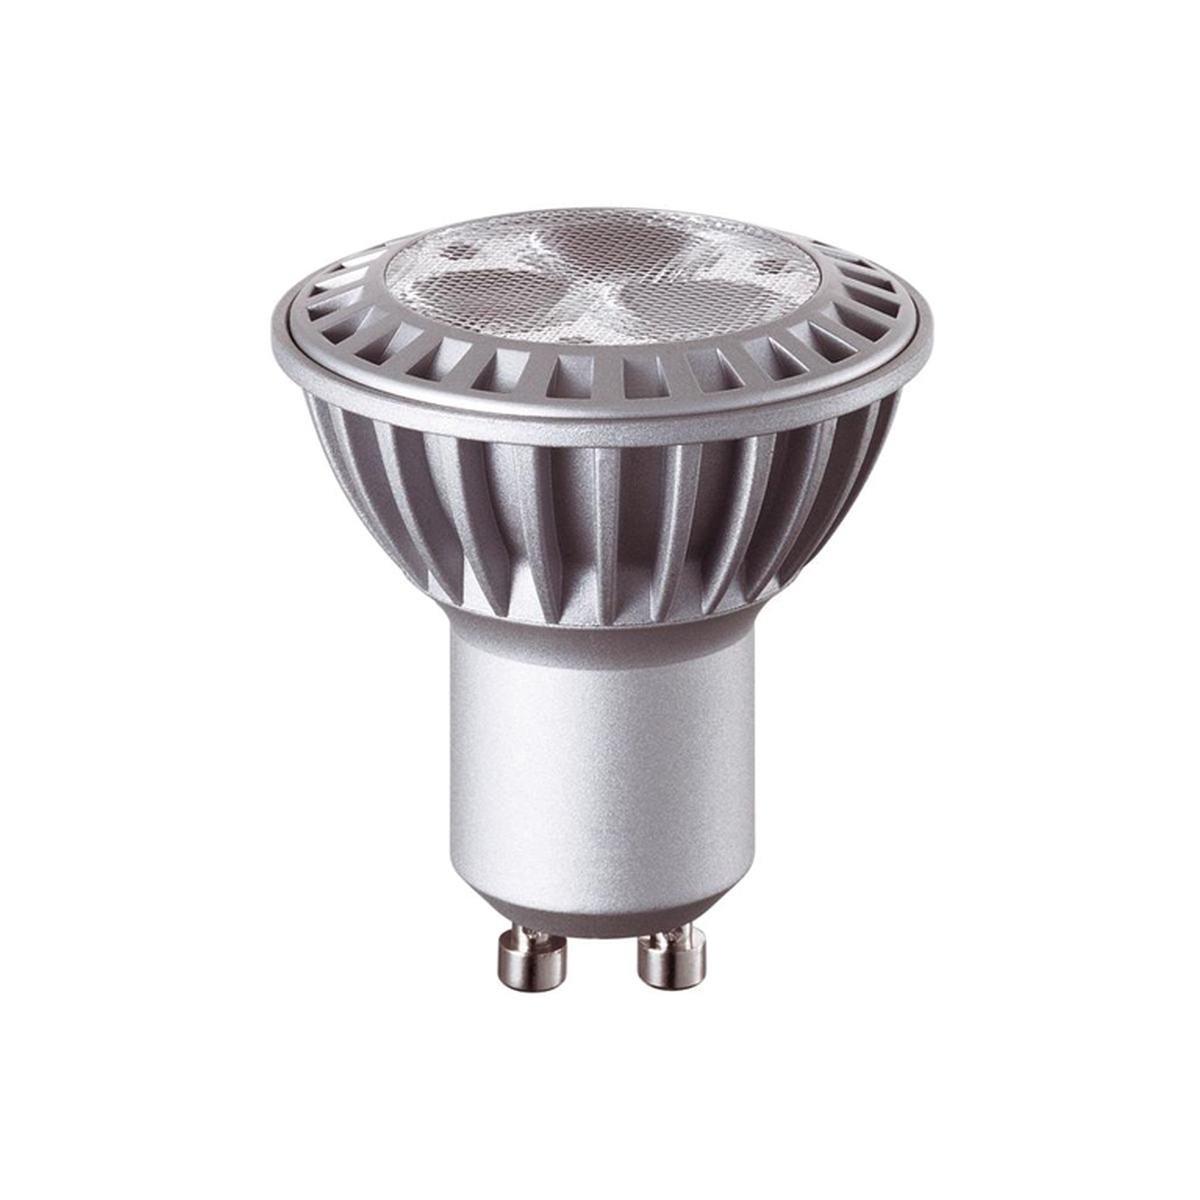 LED spot 4W (35W) GU10 ikke dæmpbar